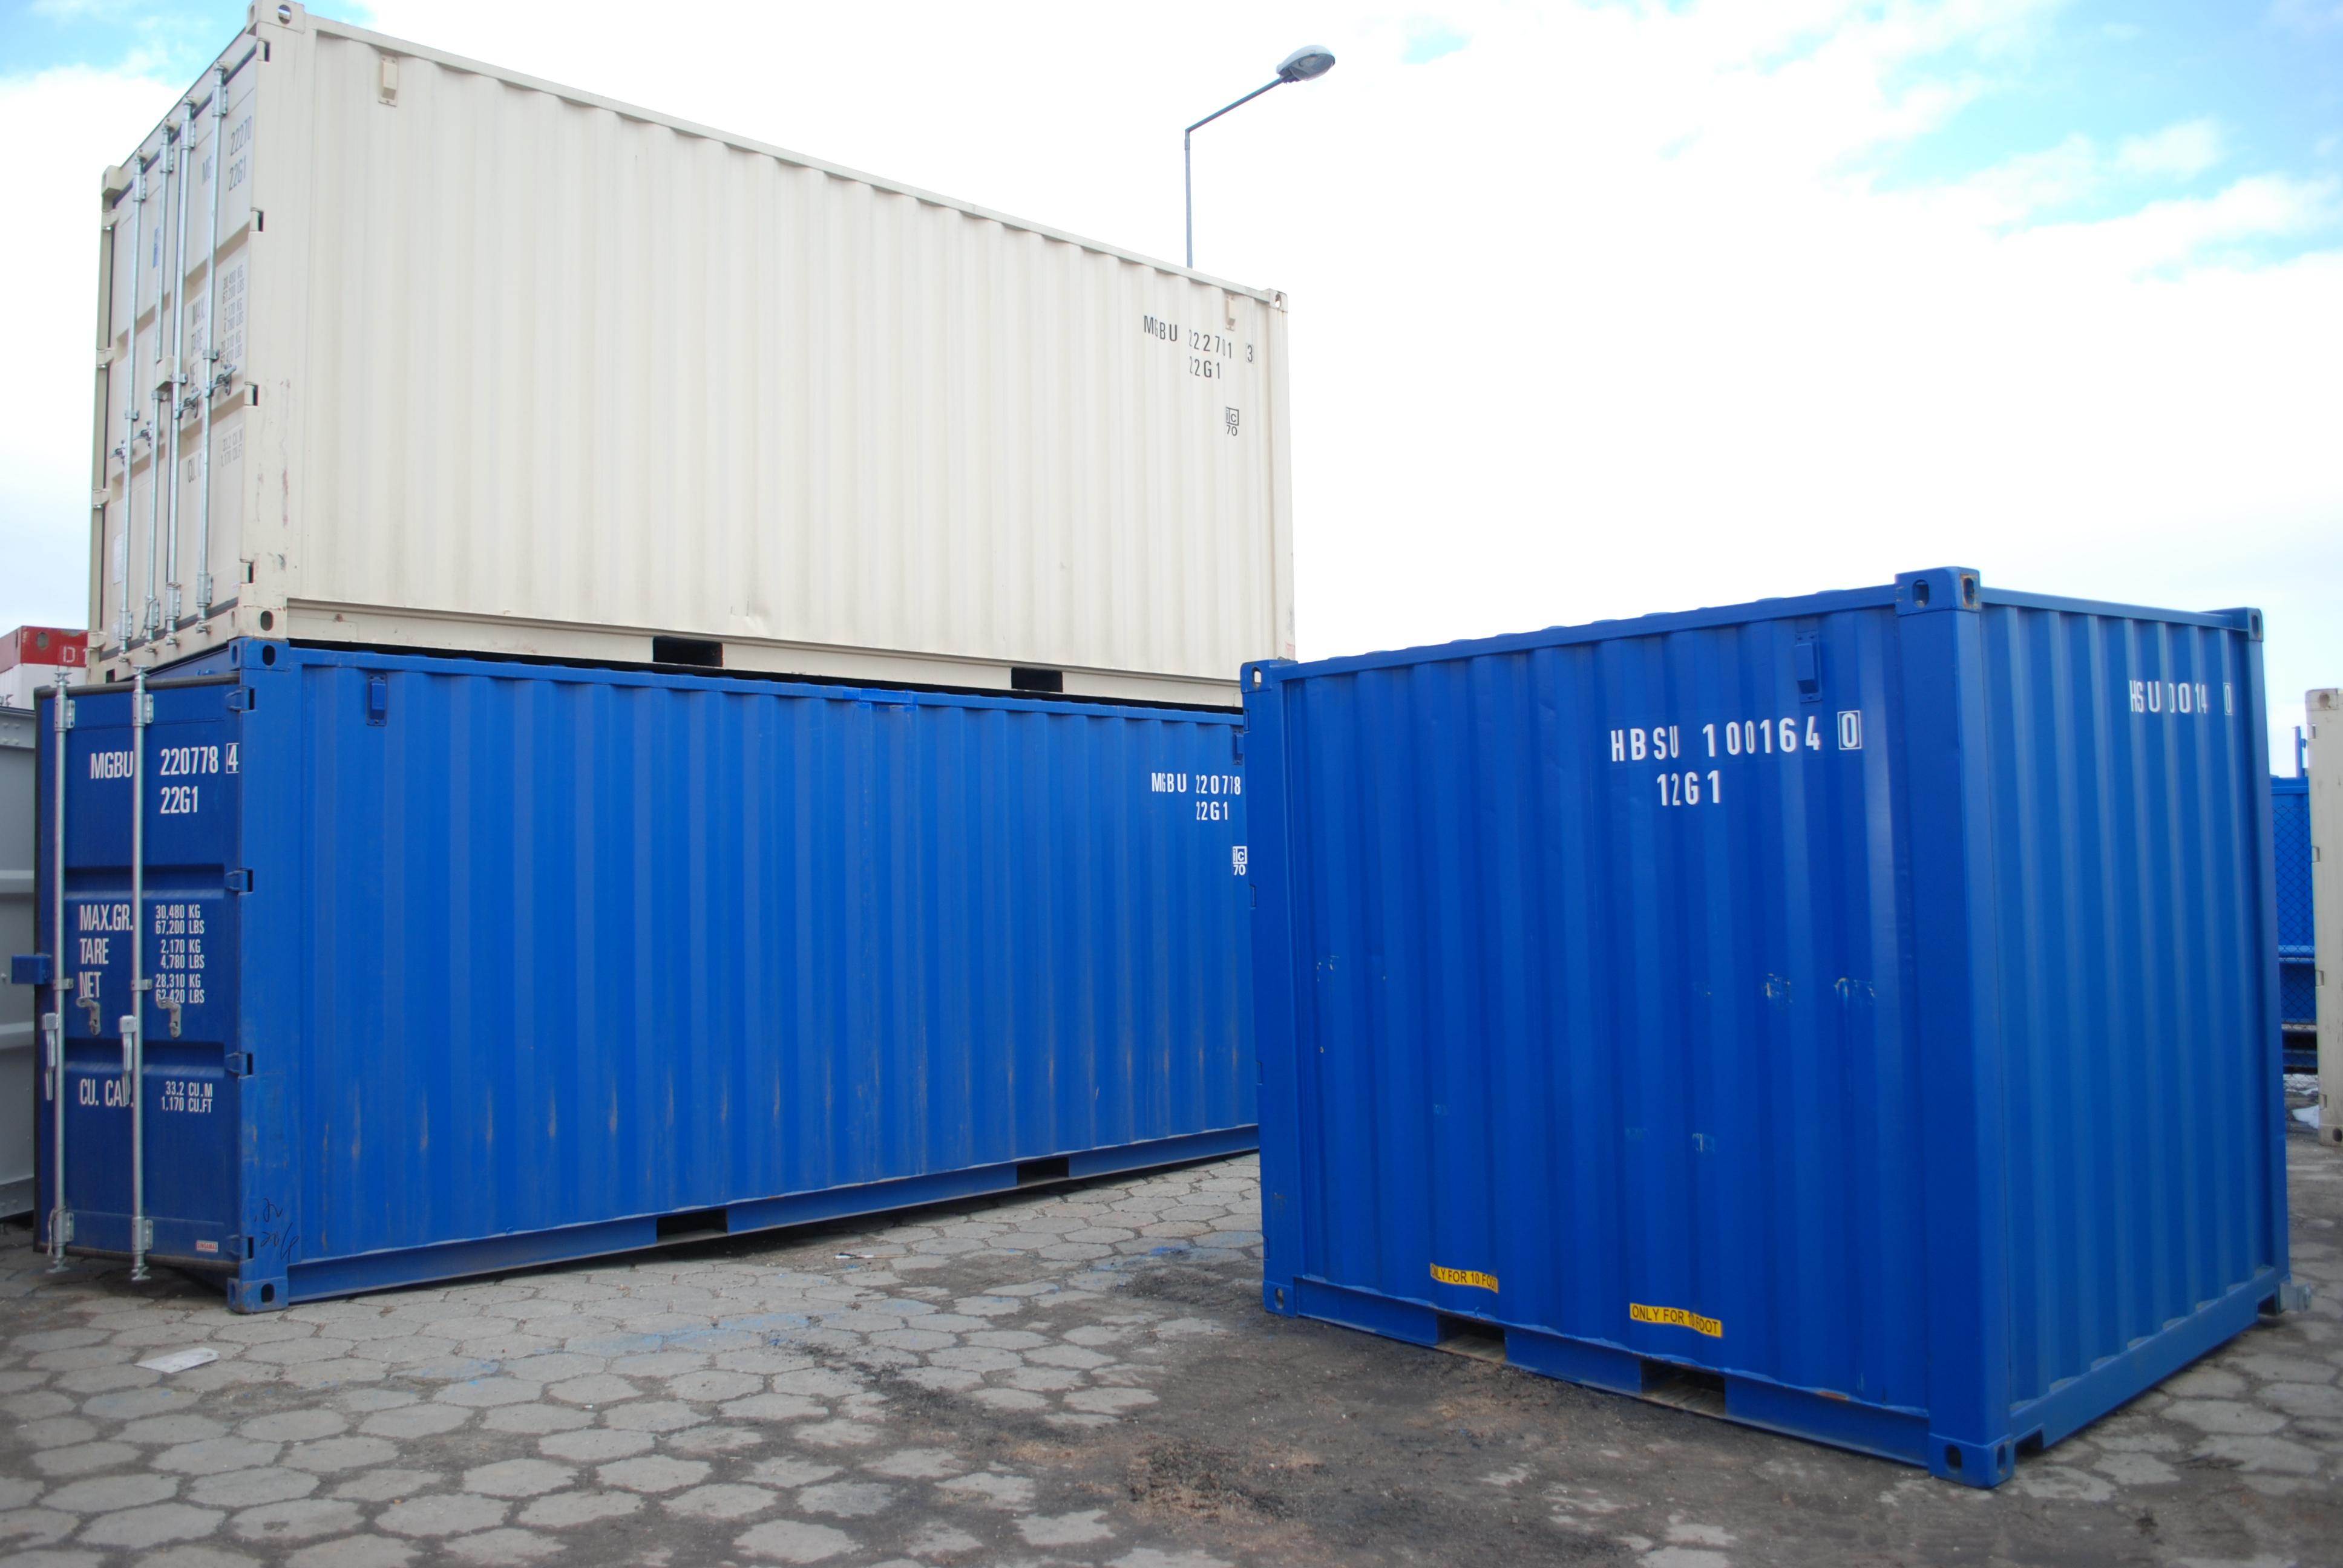 Machnik kontenery magazynowe